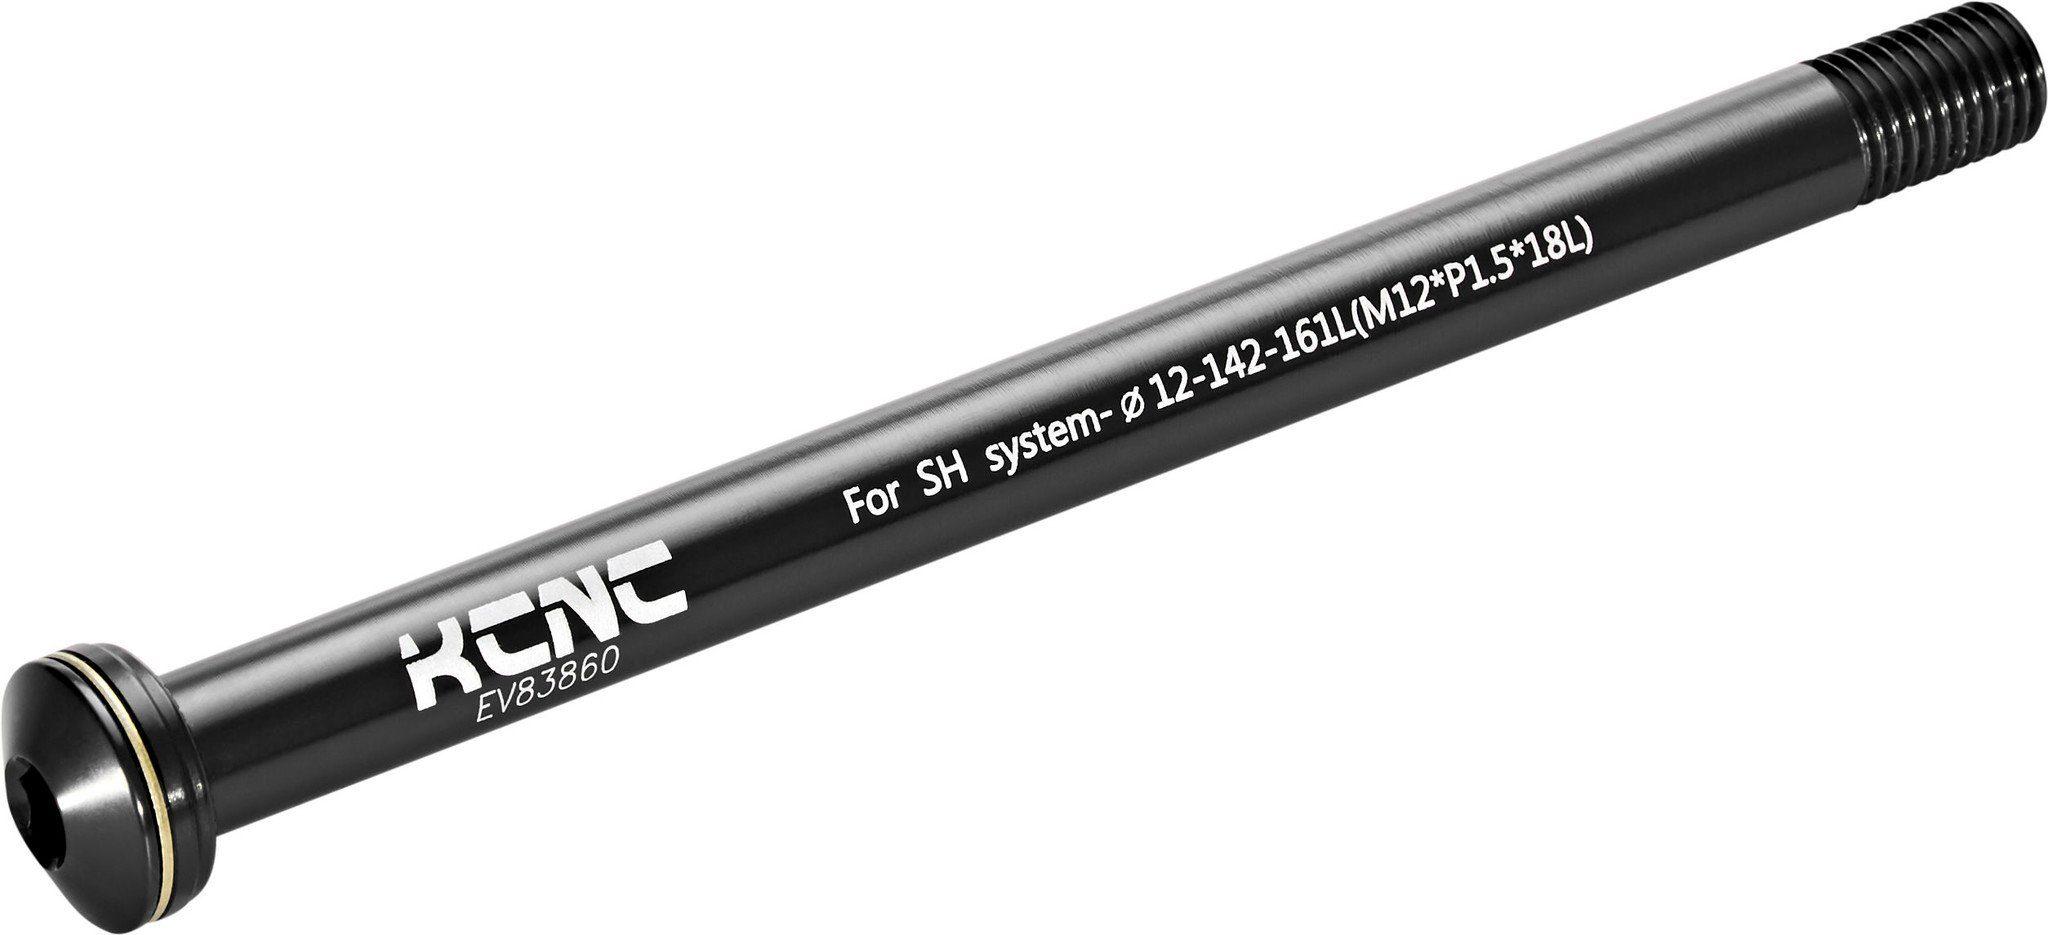 KCNC Schnellspanner »KQR08-SH Steckachse 12x142mm Shimano E-Thru 161mm«